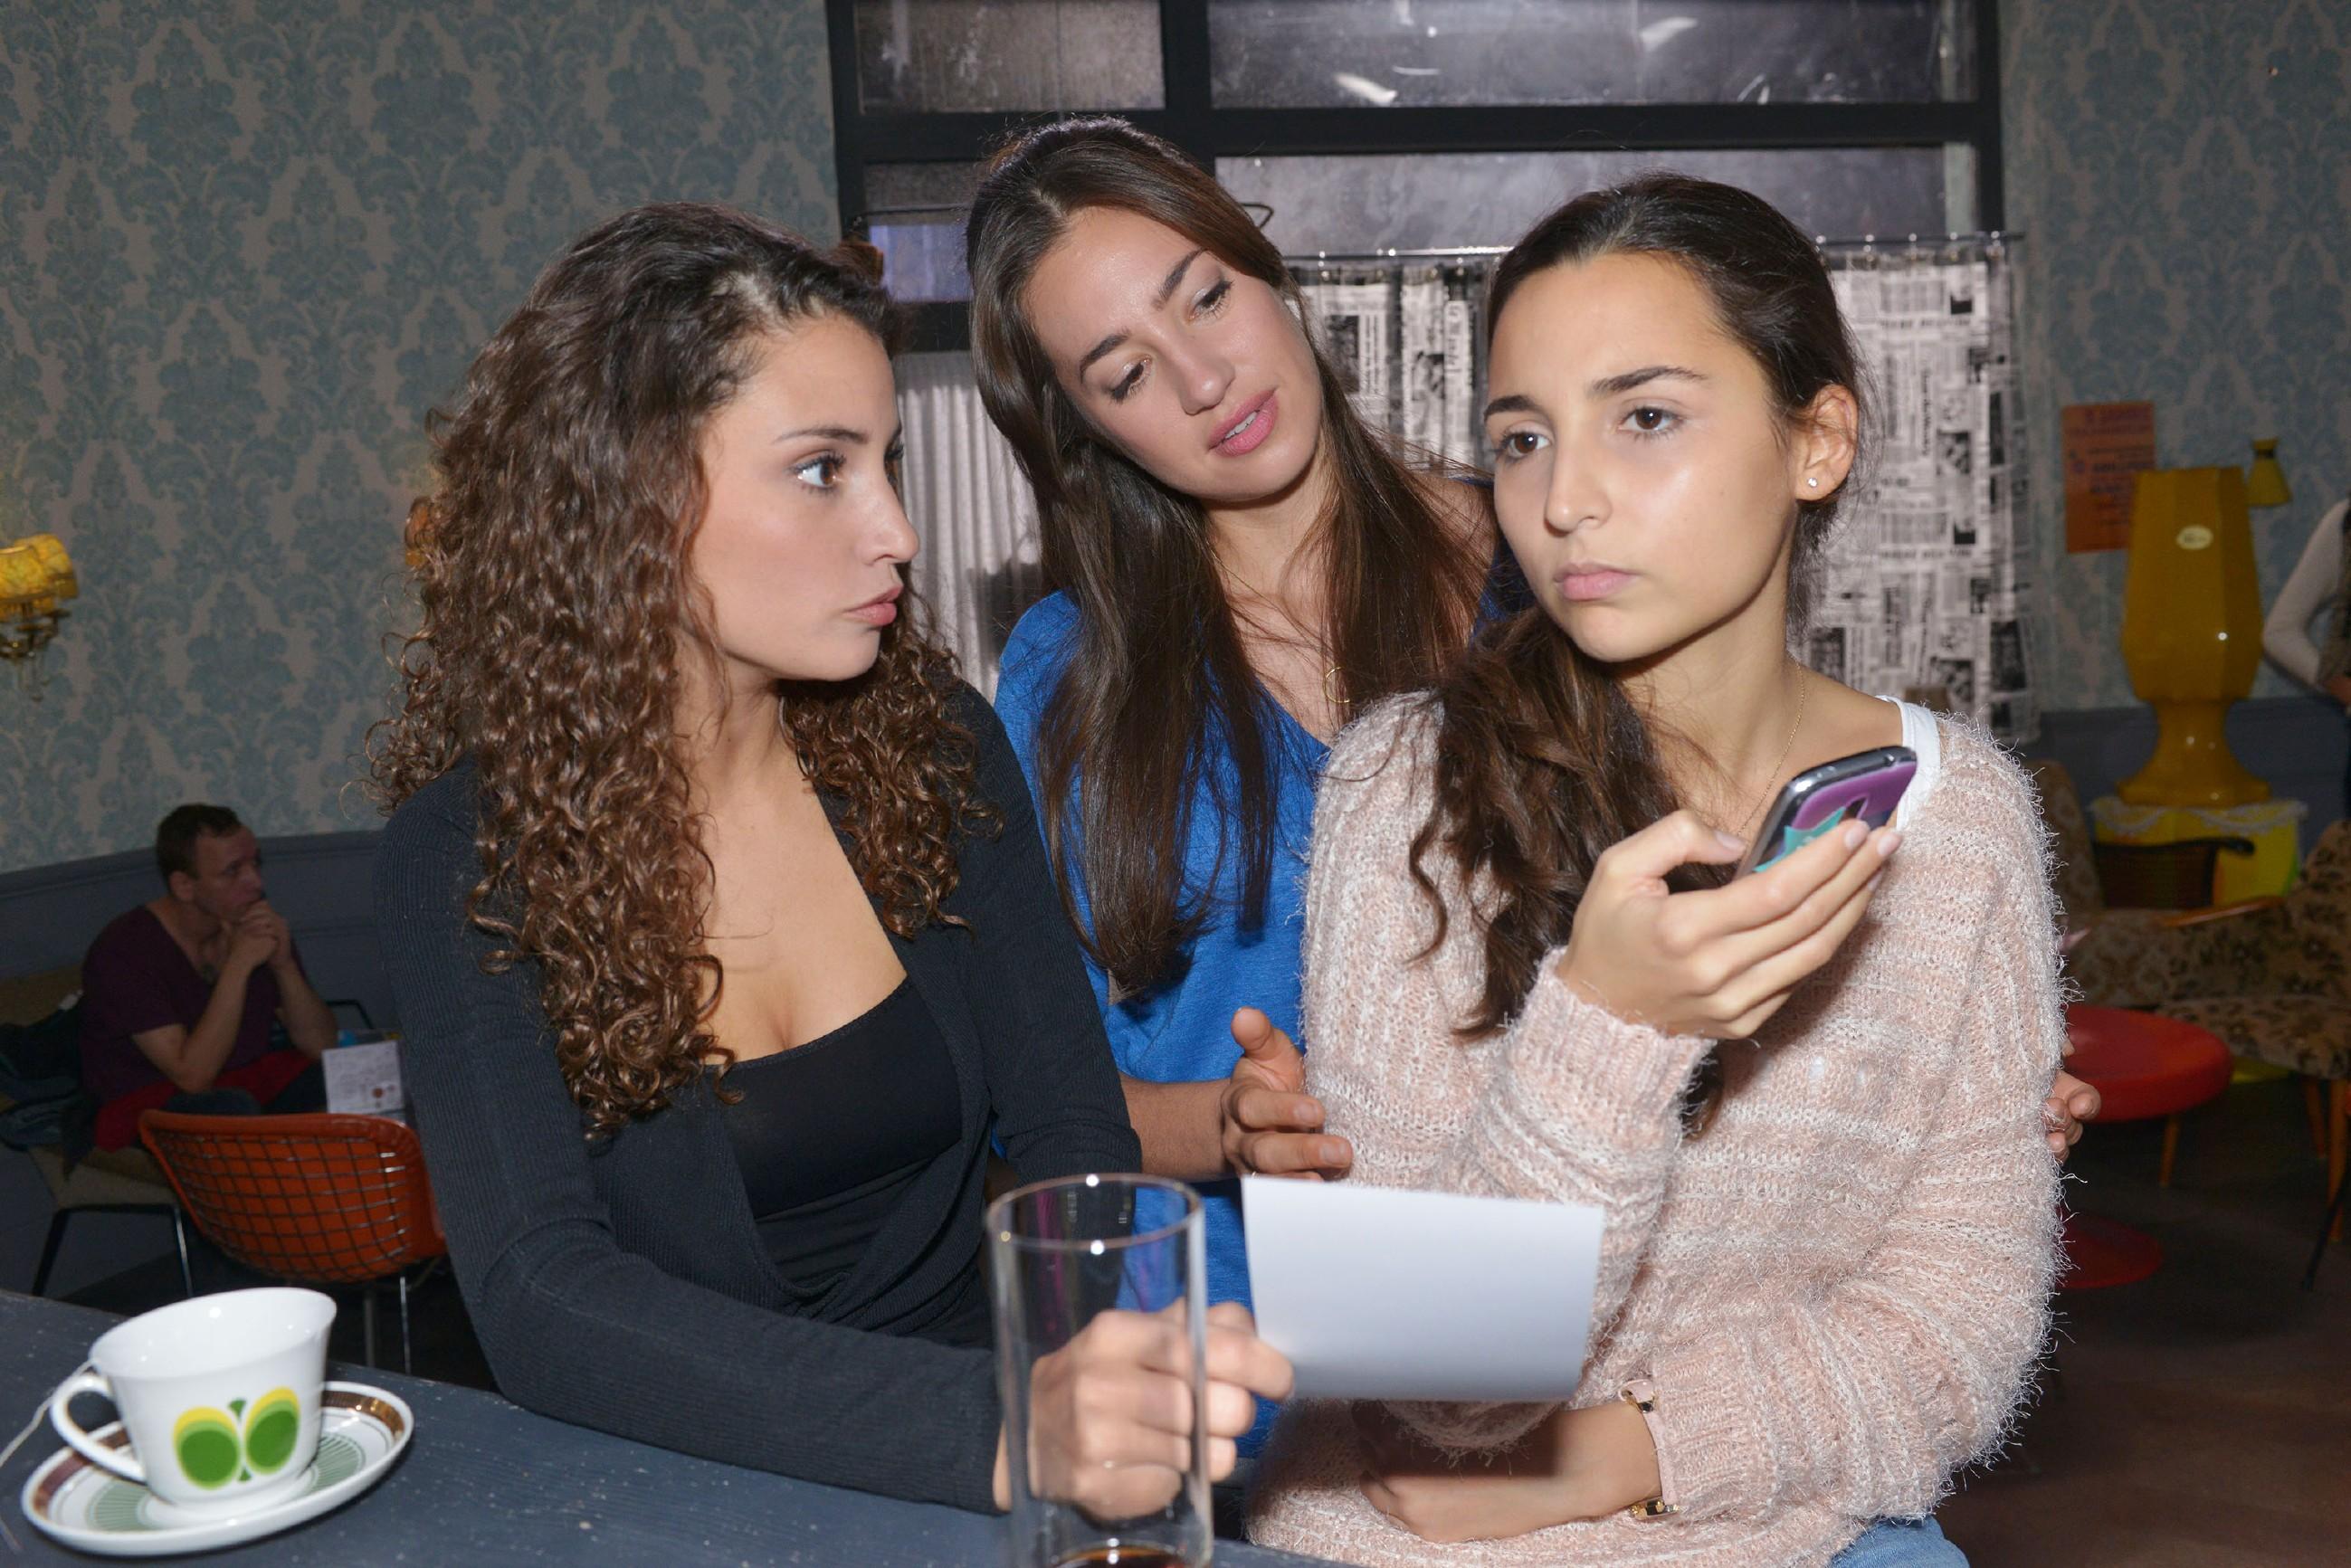 Ayla (Nadine Menz, l.) und Elena (Elena Garcia Gerlach, M.) kümmern sich um Selma (Rona Özkan), die Liebeskummer wegen Jonas hat. (Quelle: RTL / Rolf Baumgartner)